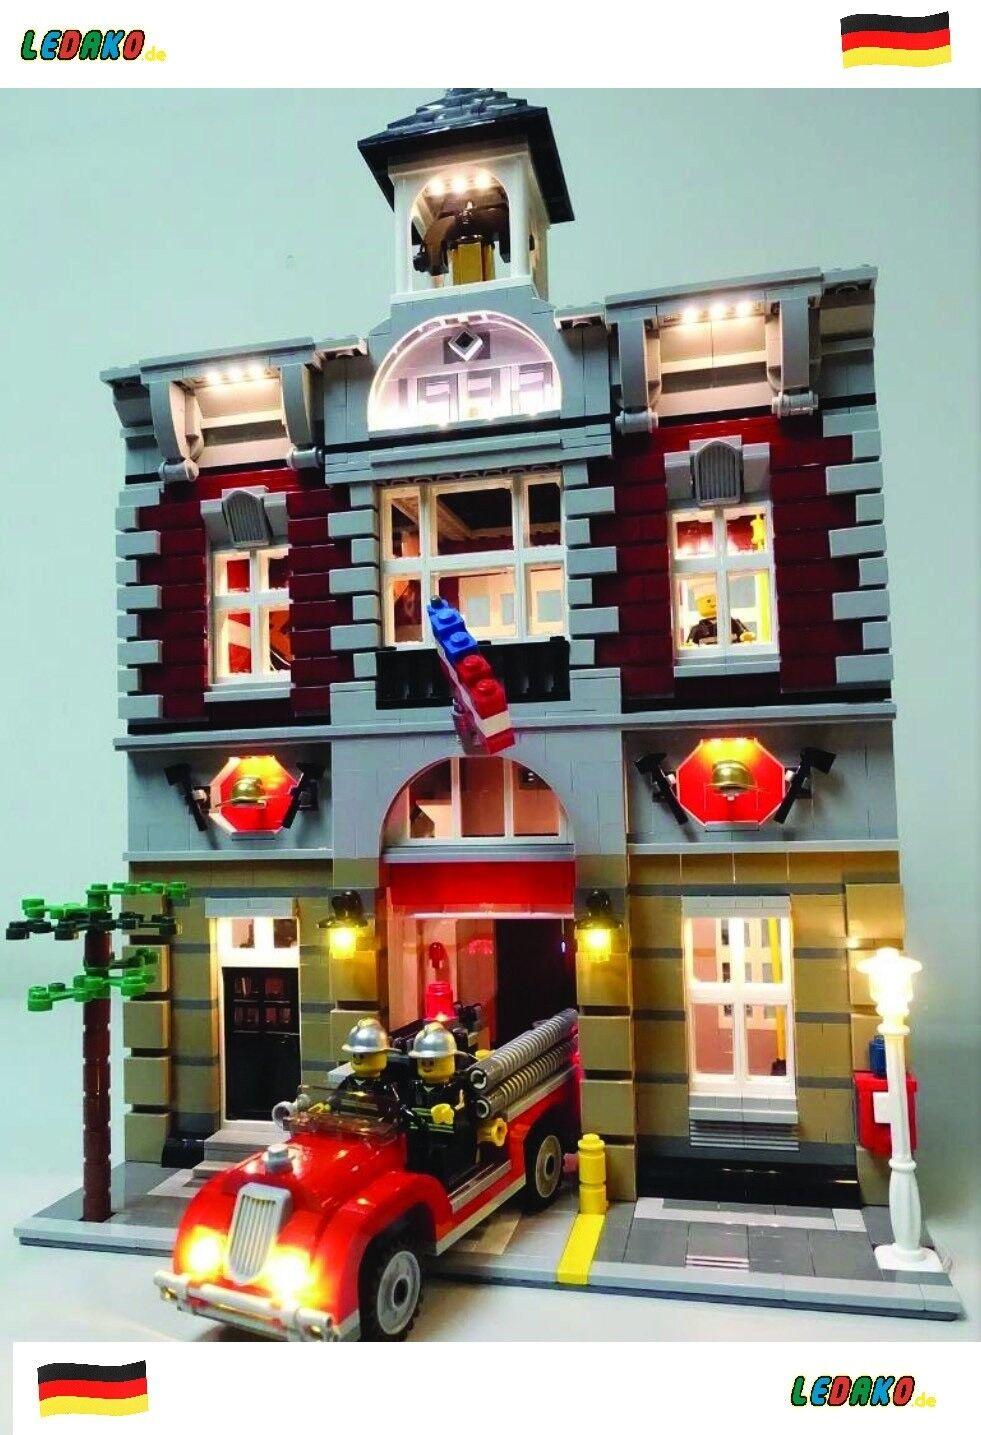 vendita outlet LED beleuchtungsset KIT PER LEGO ® ® ® per 10197 di ledako LIGHT GERuomoY  prezzo all'ingrosso